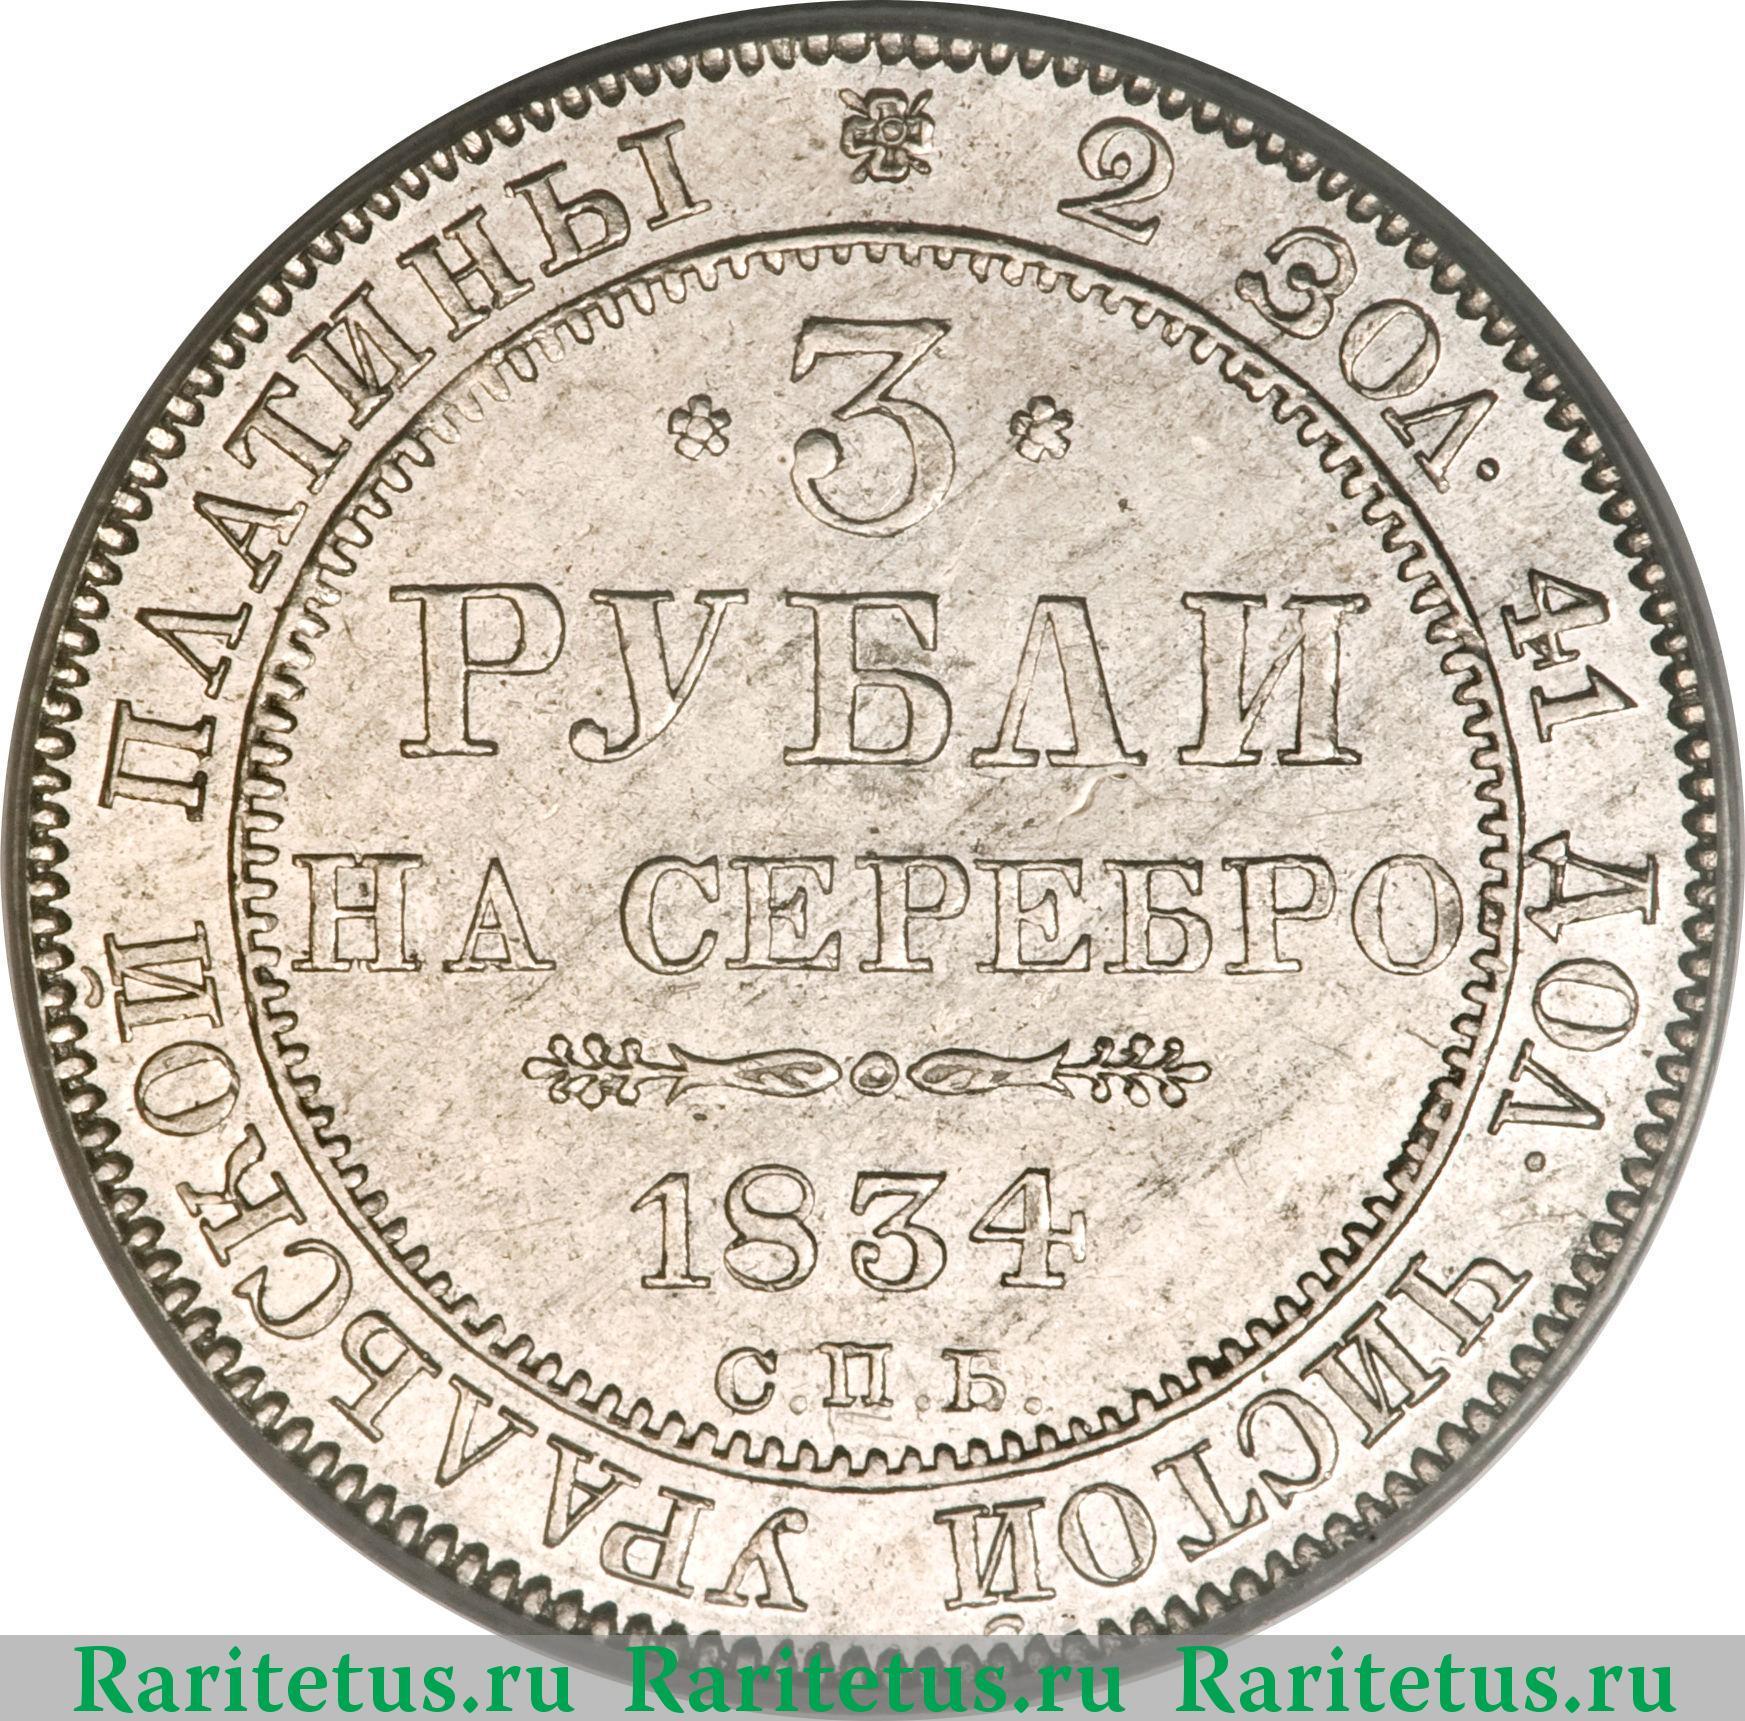 Три рубля серебро скупка монет в самаре цены